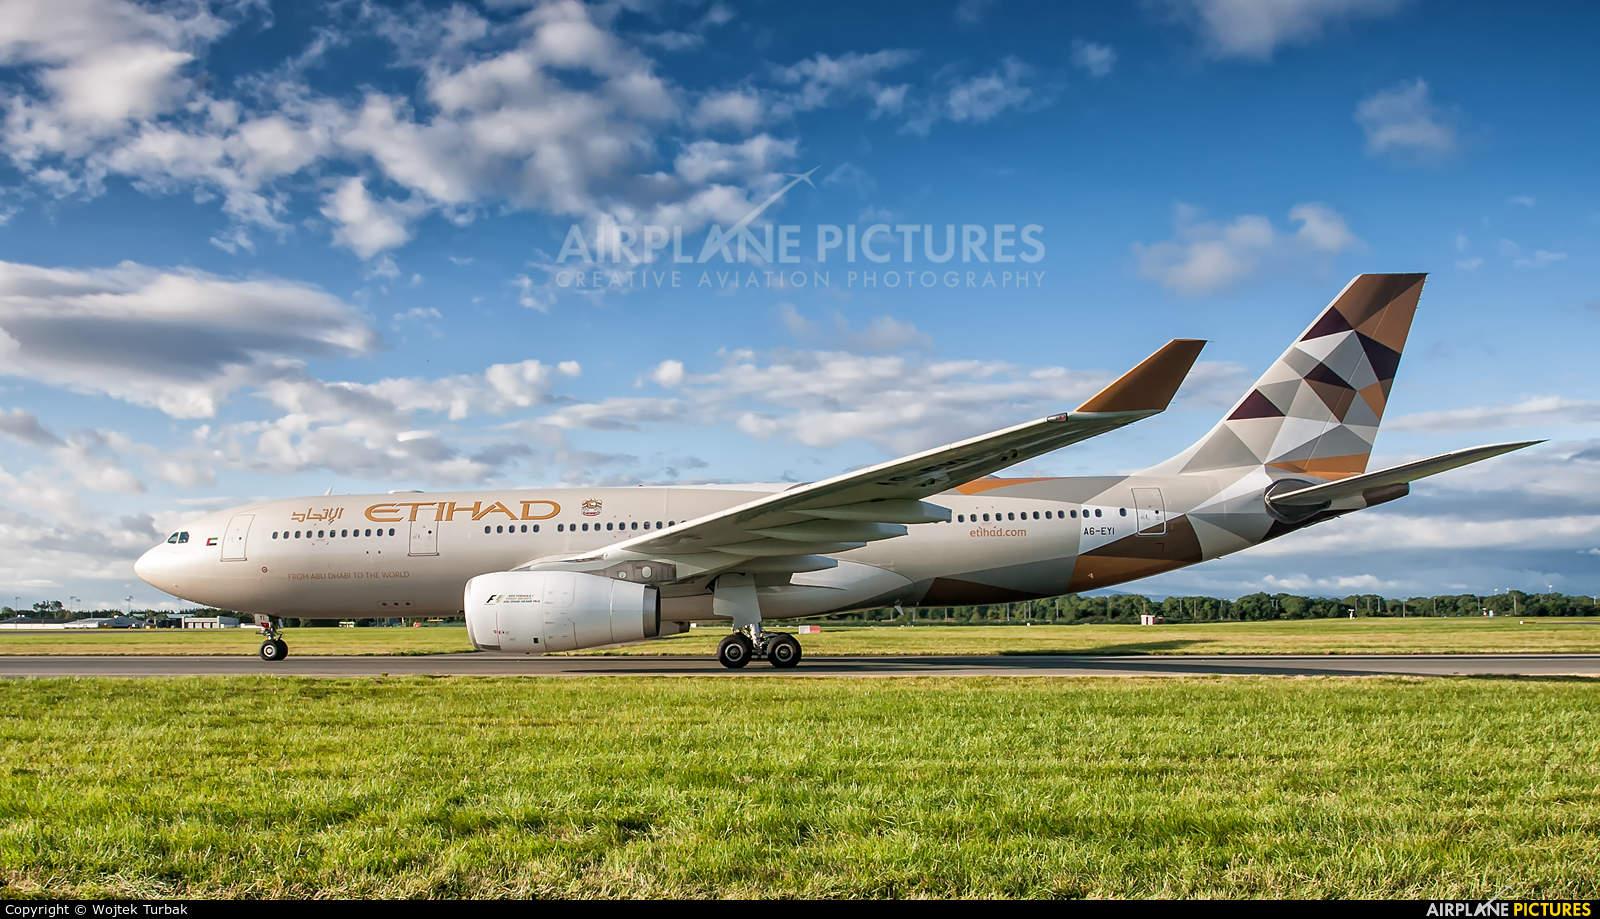 Captain delays Etihad flight for Grand-Parents to visit dying grandson